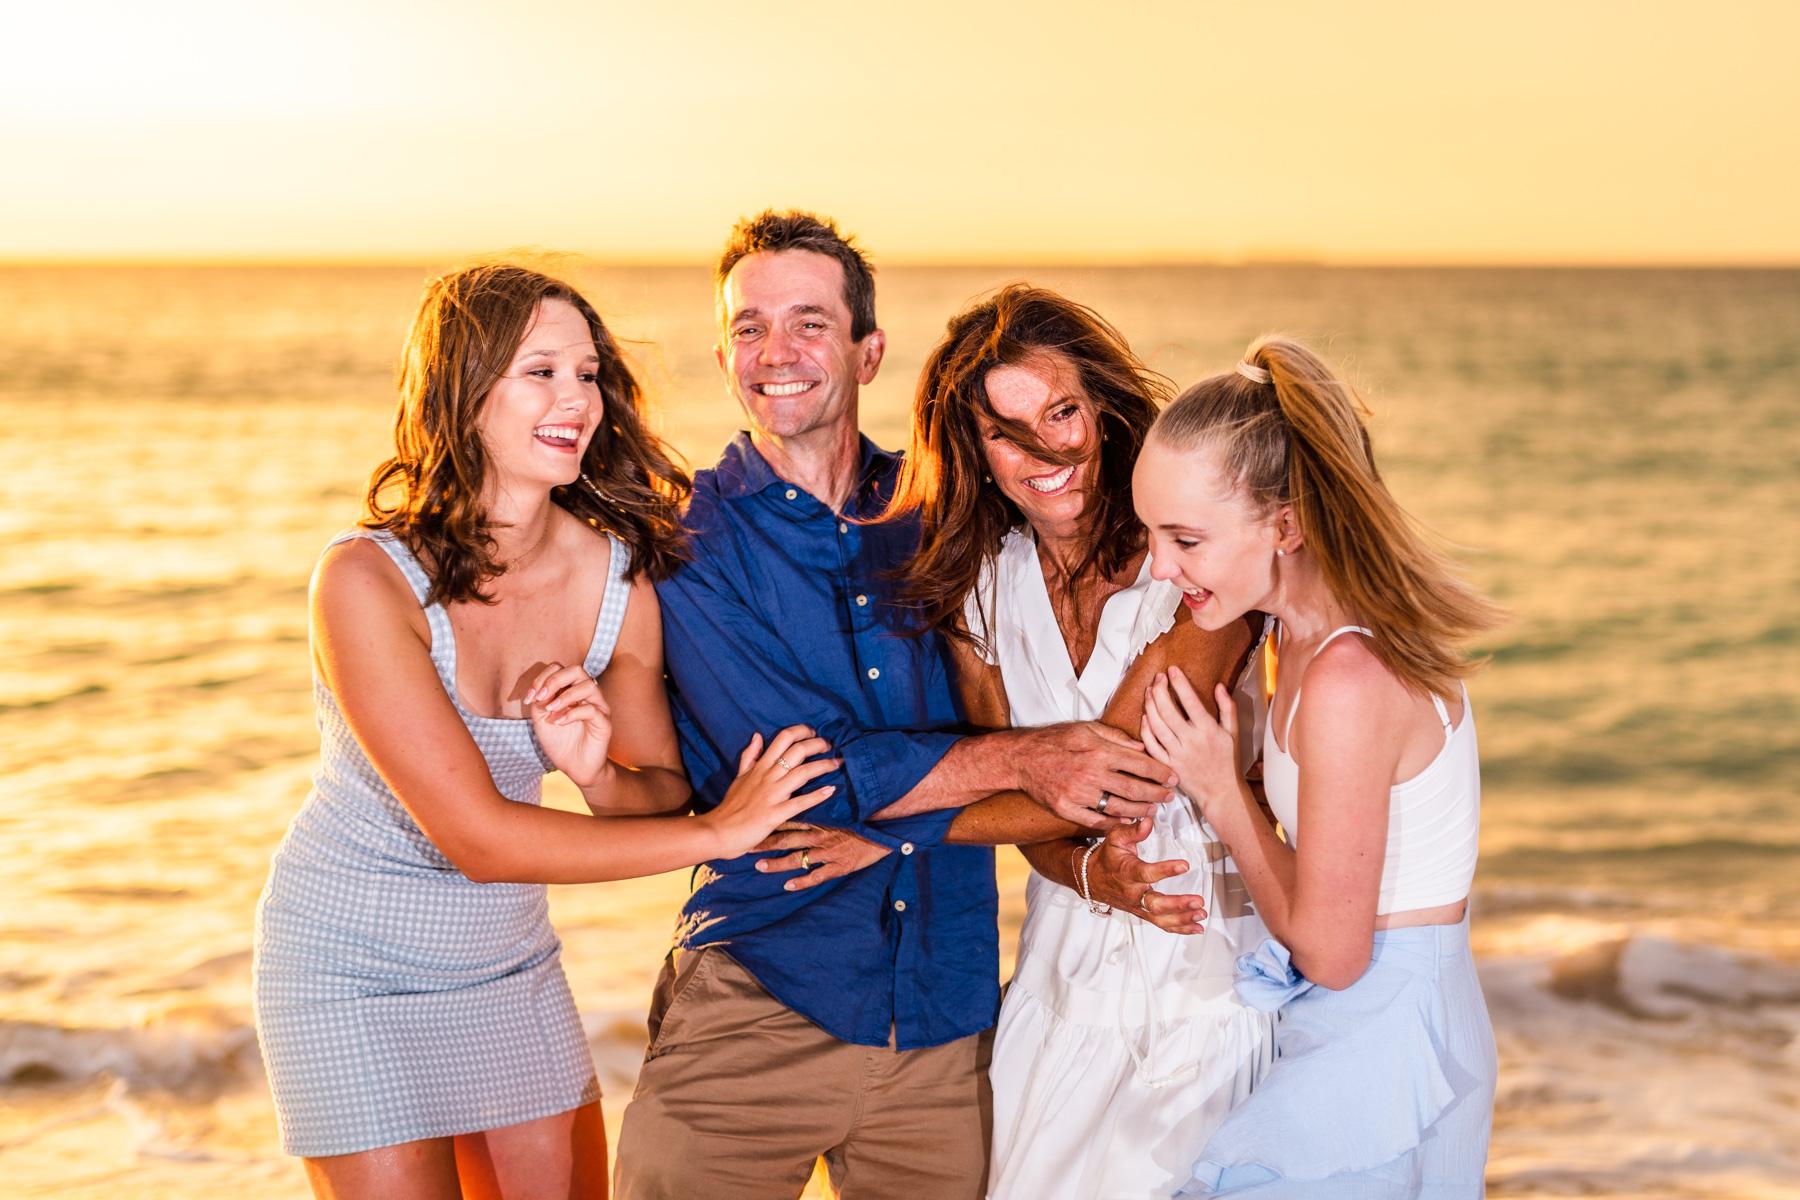 Spyrides_Kyle_Soul.Gazing.Photography_Family.Photographer.Perth_Portrait.Photography_Family.Beach.Photos_Sand.Tax.Beach_Sunset.Fremantle.Dog.Beach_8.1.2019_DSC2875.jpg